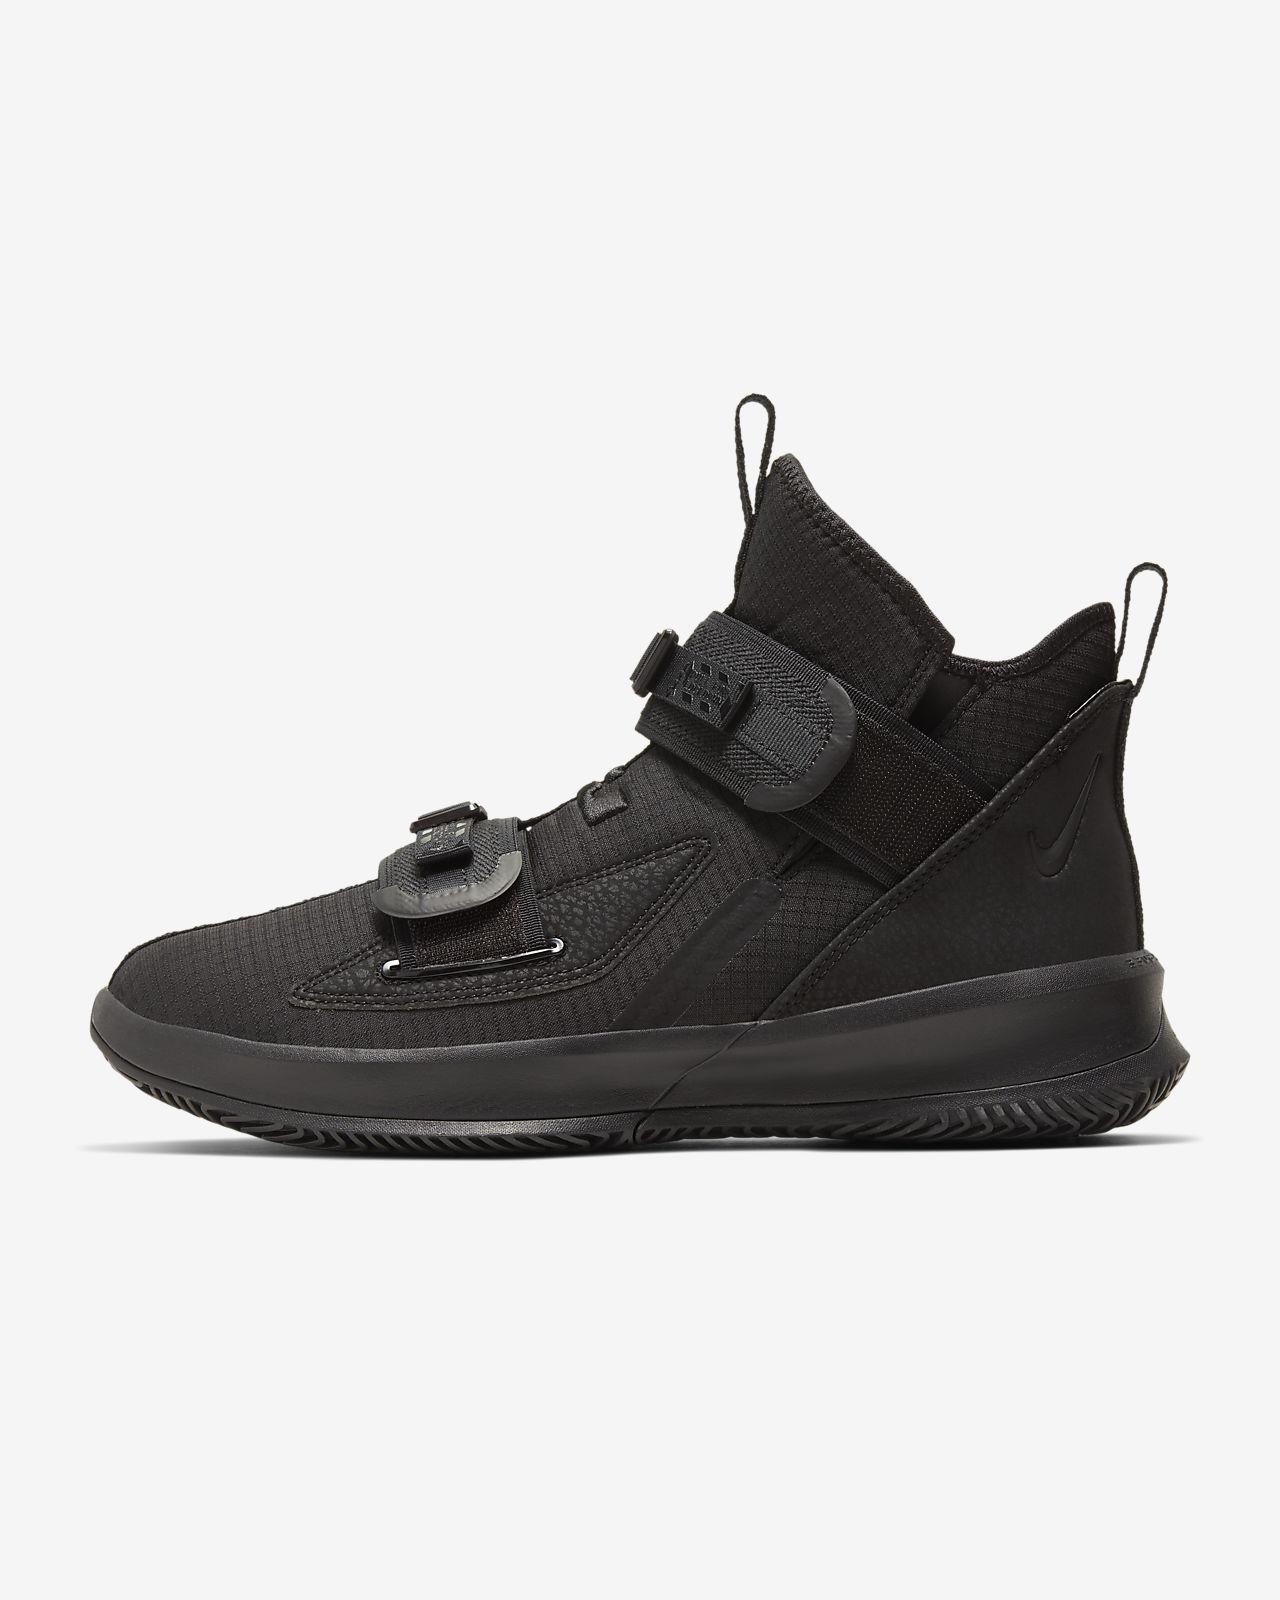 LeBron Soldier 13 SFG Basketball Shoe